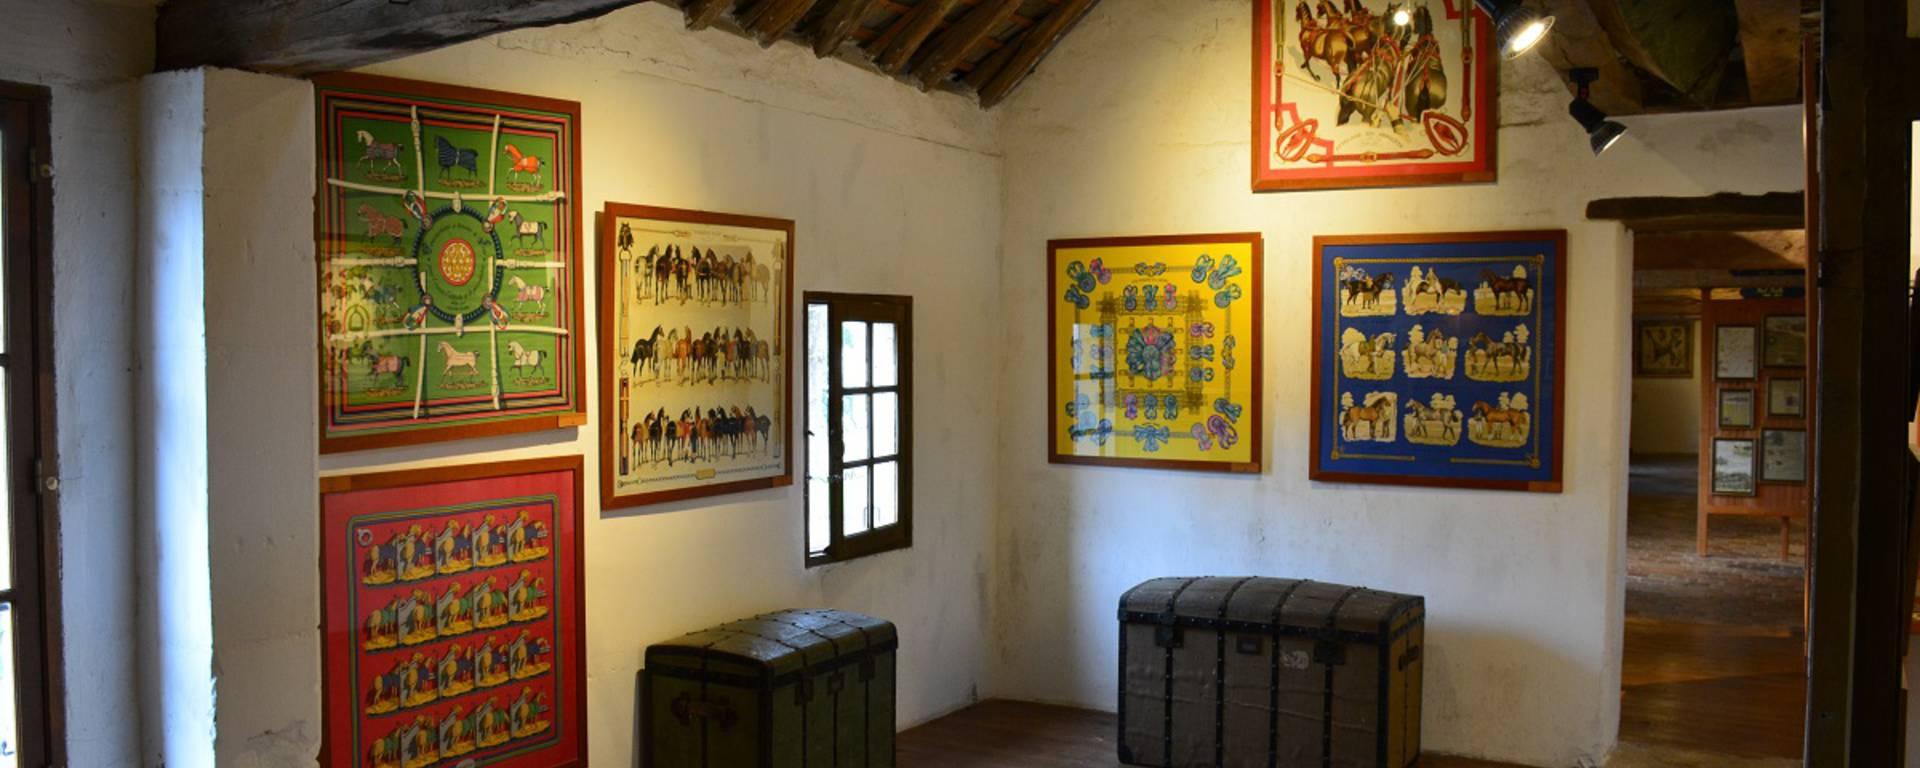 Der Hermes-Saal in Schloss Montpoupon  © OTBC